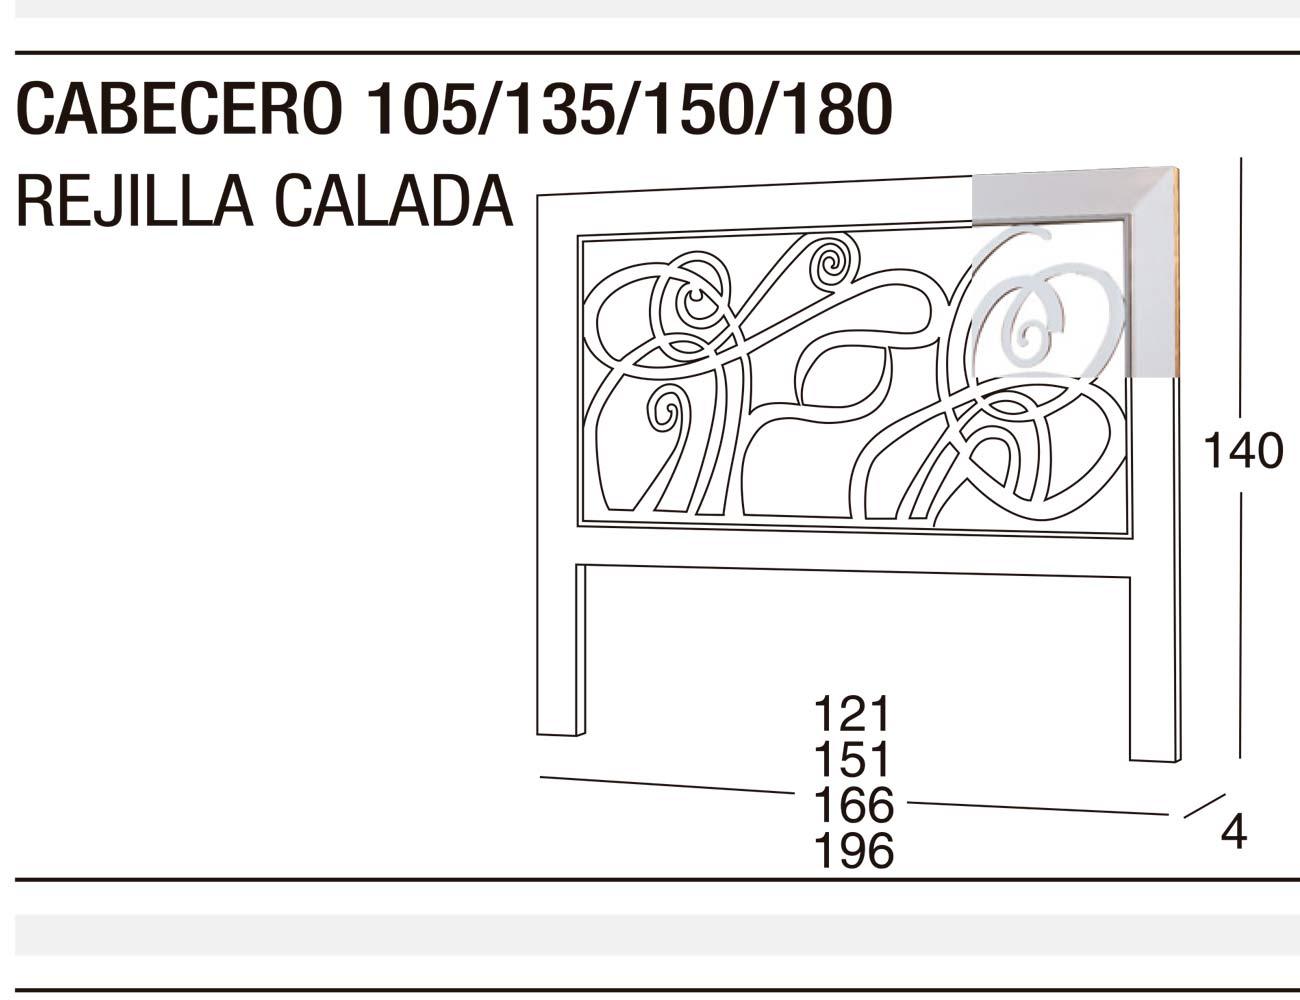 Cabecero 135 150 rejilla calada